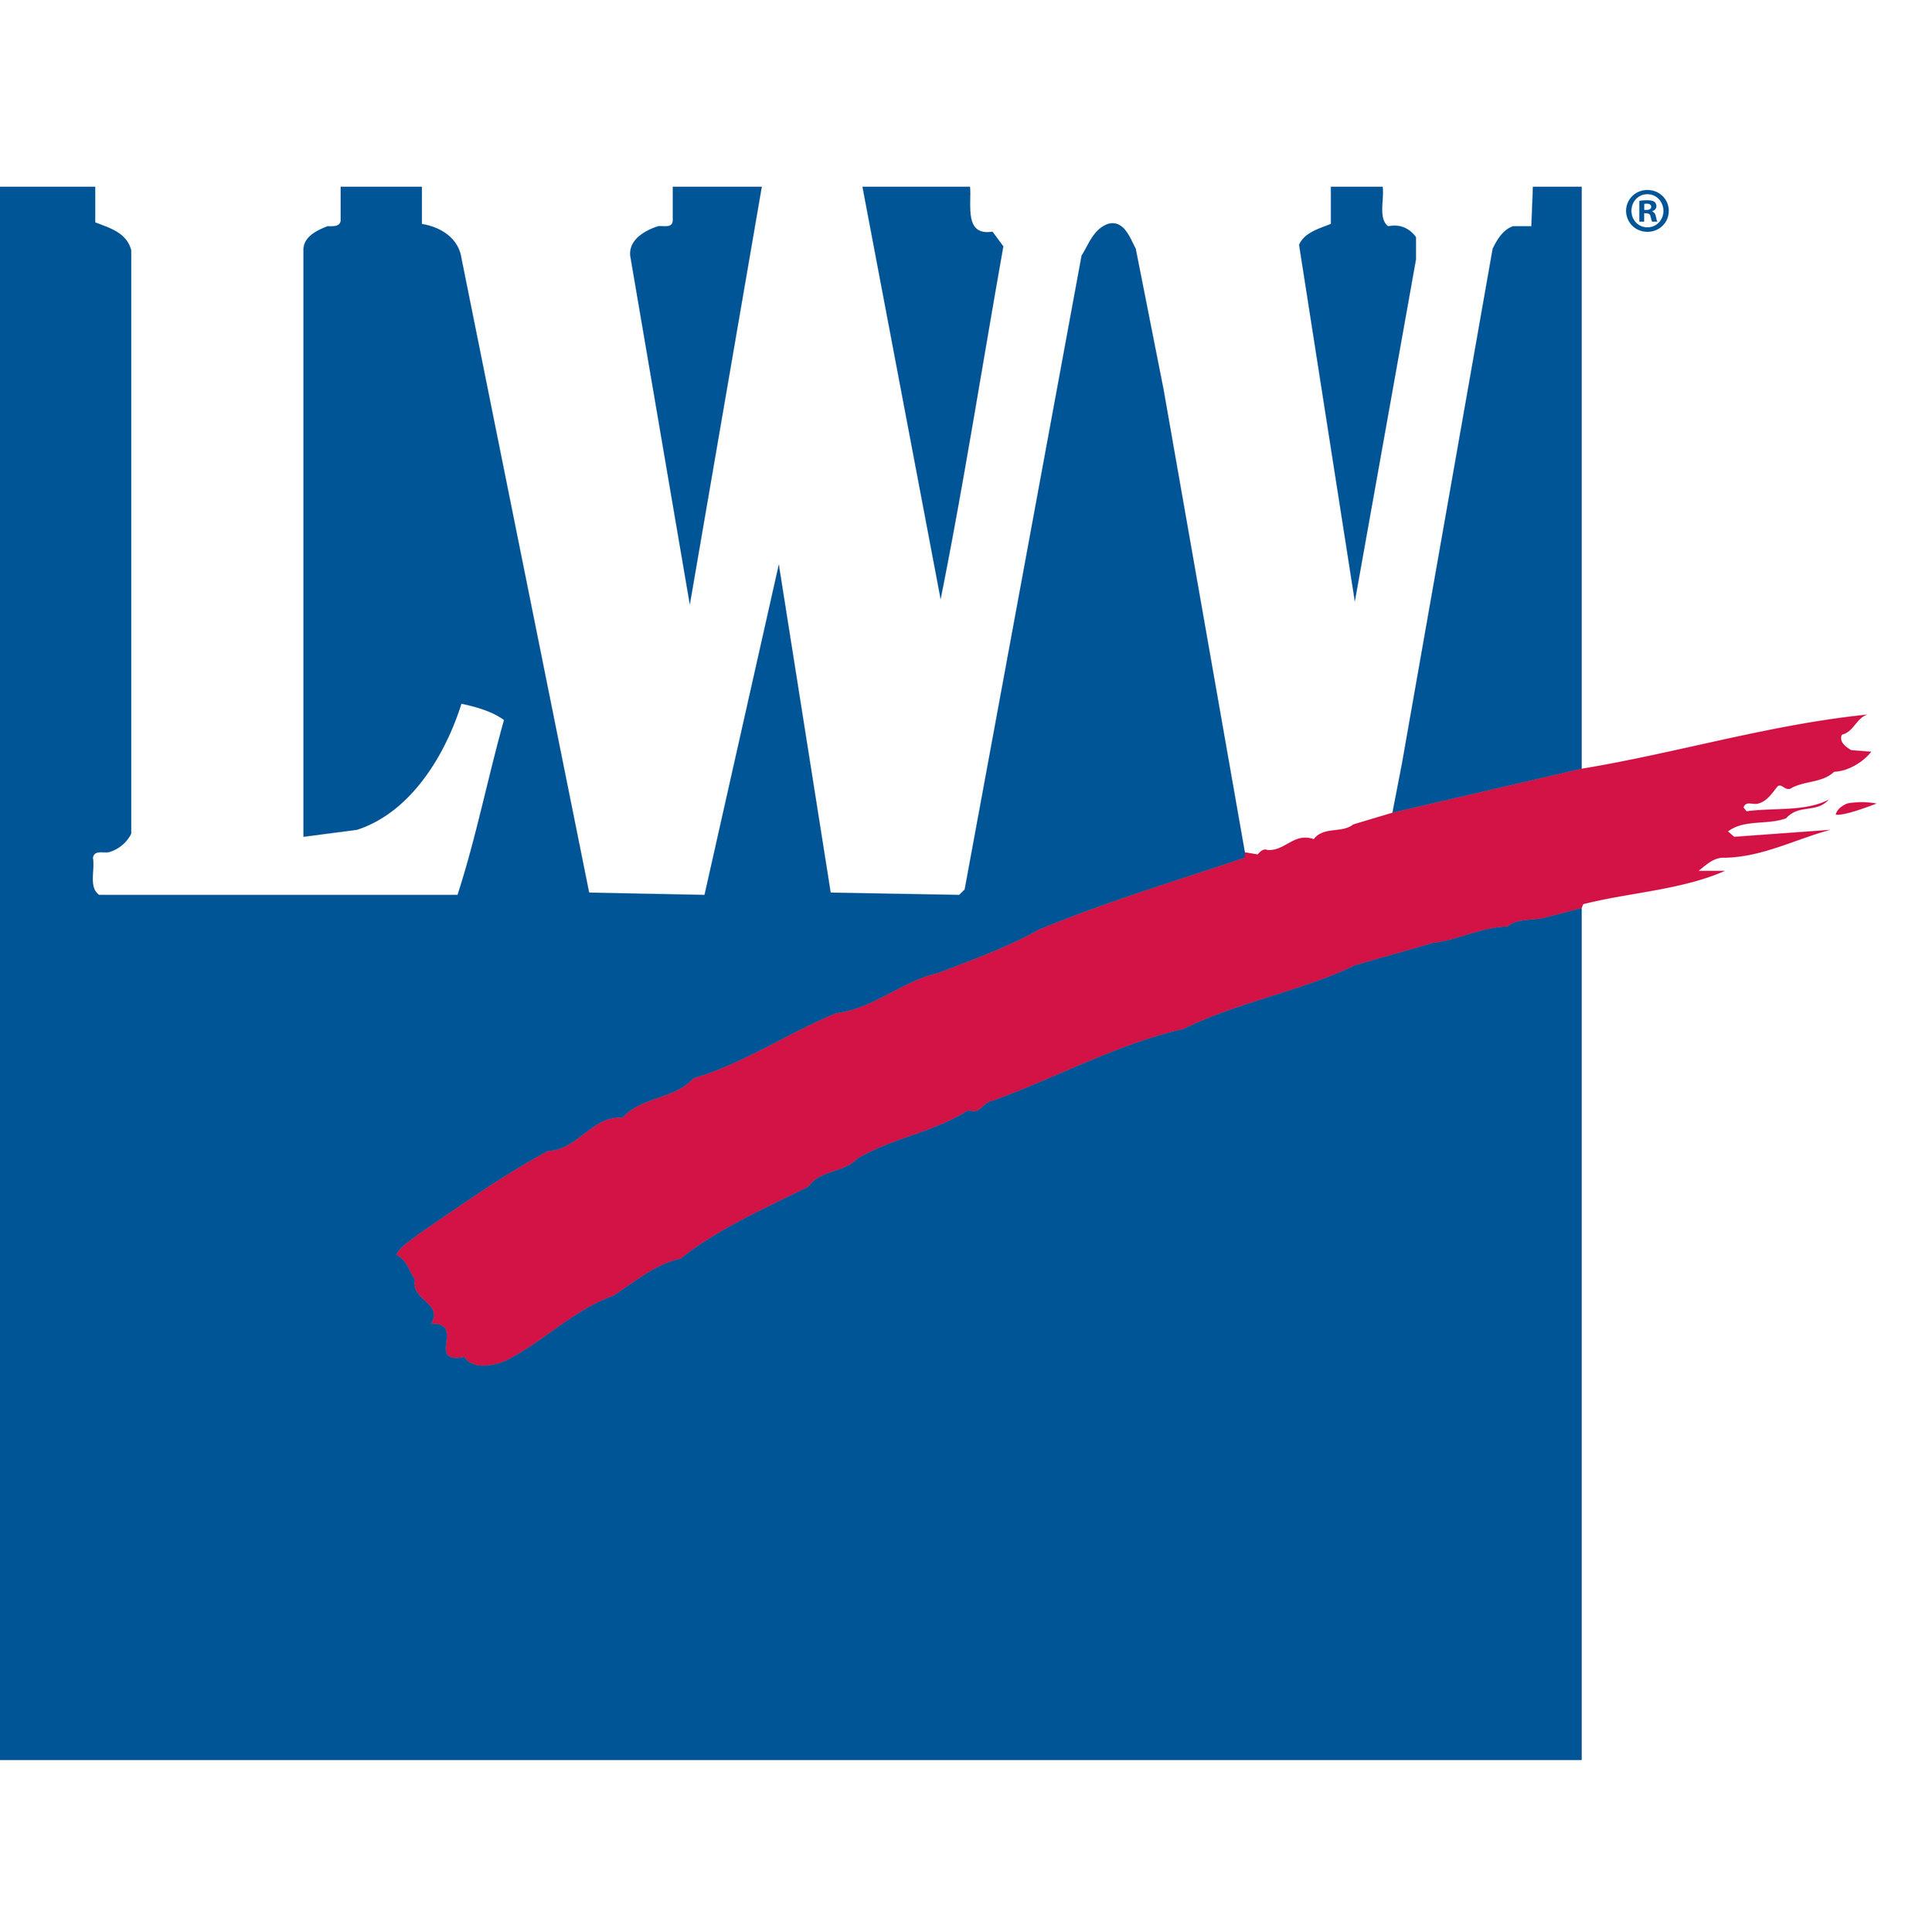 lwv-logo_color-2.jpg